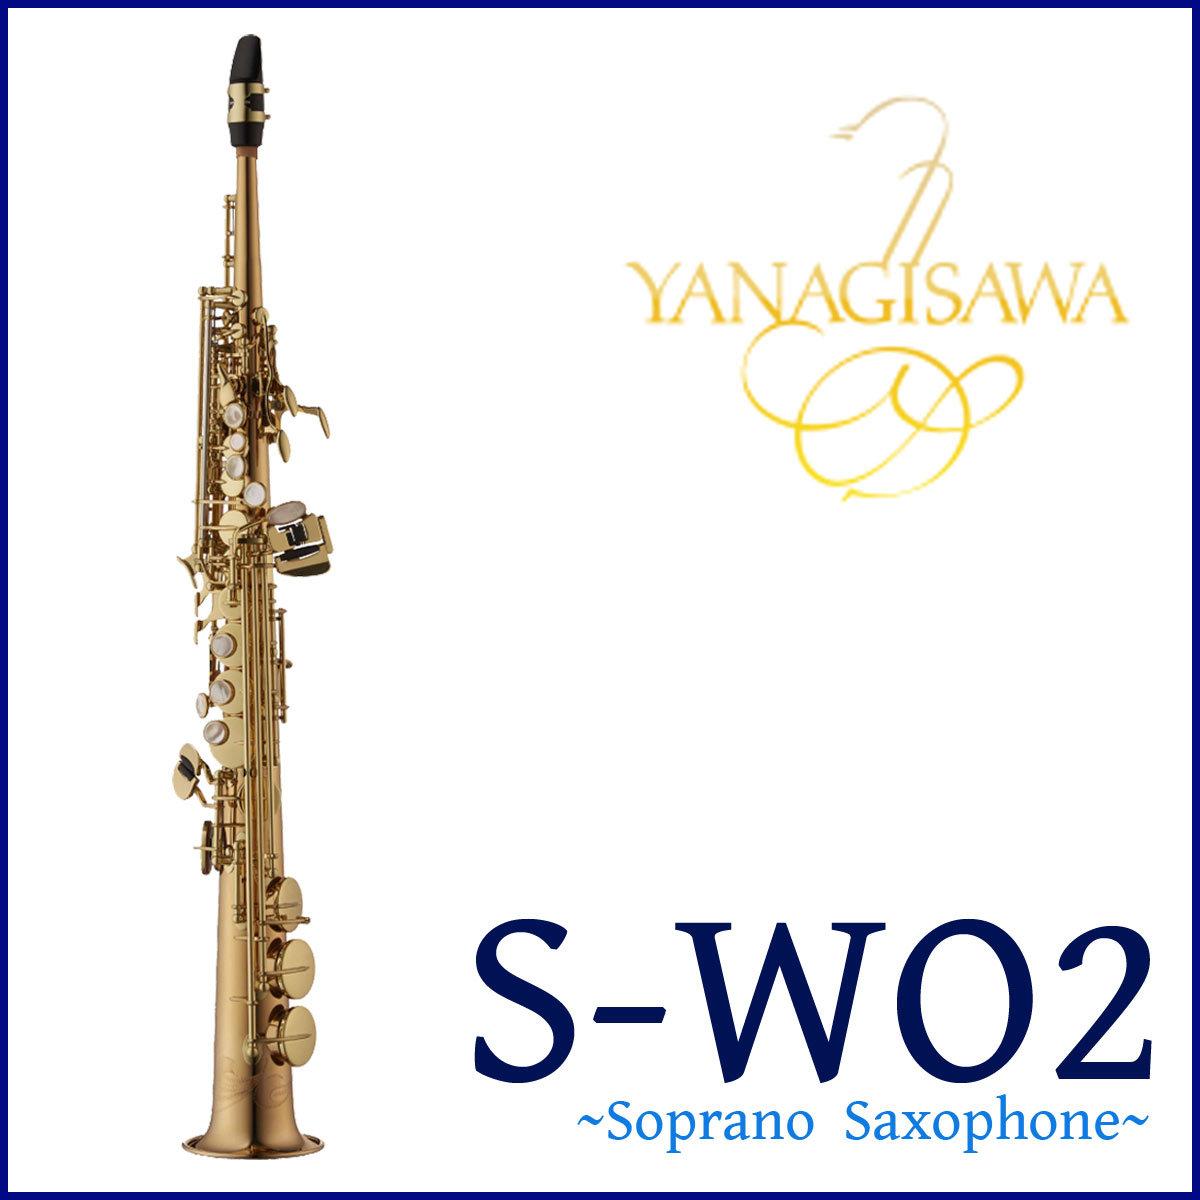 YANAGISAWA S-WO2 soprano sax WO series [Yokohama]